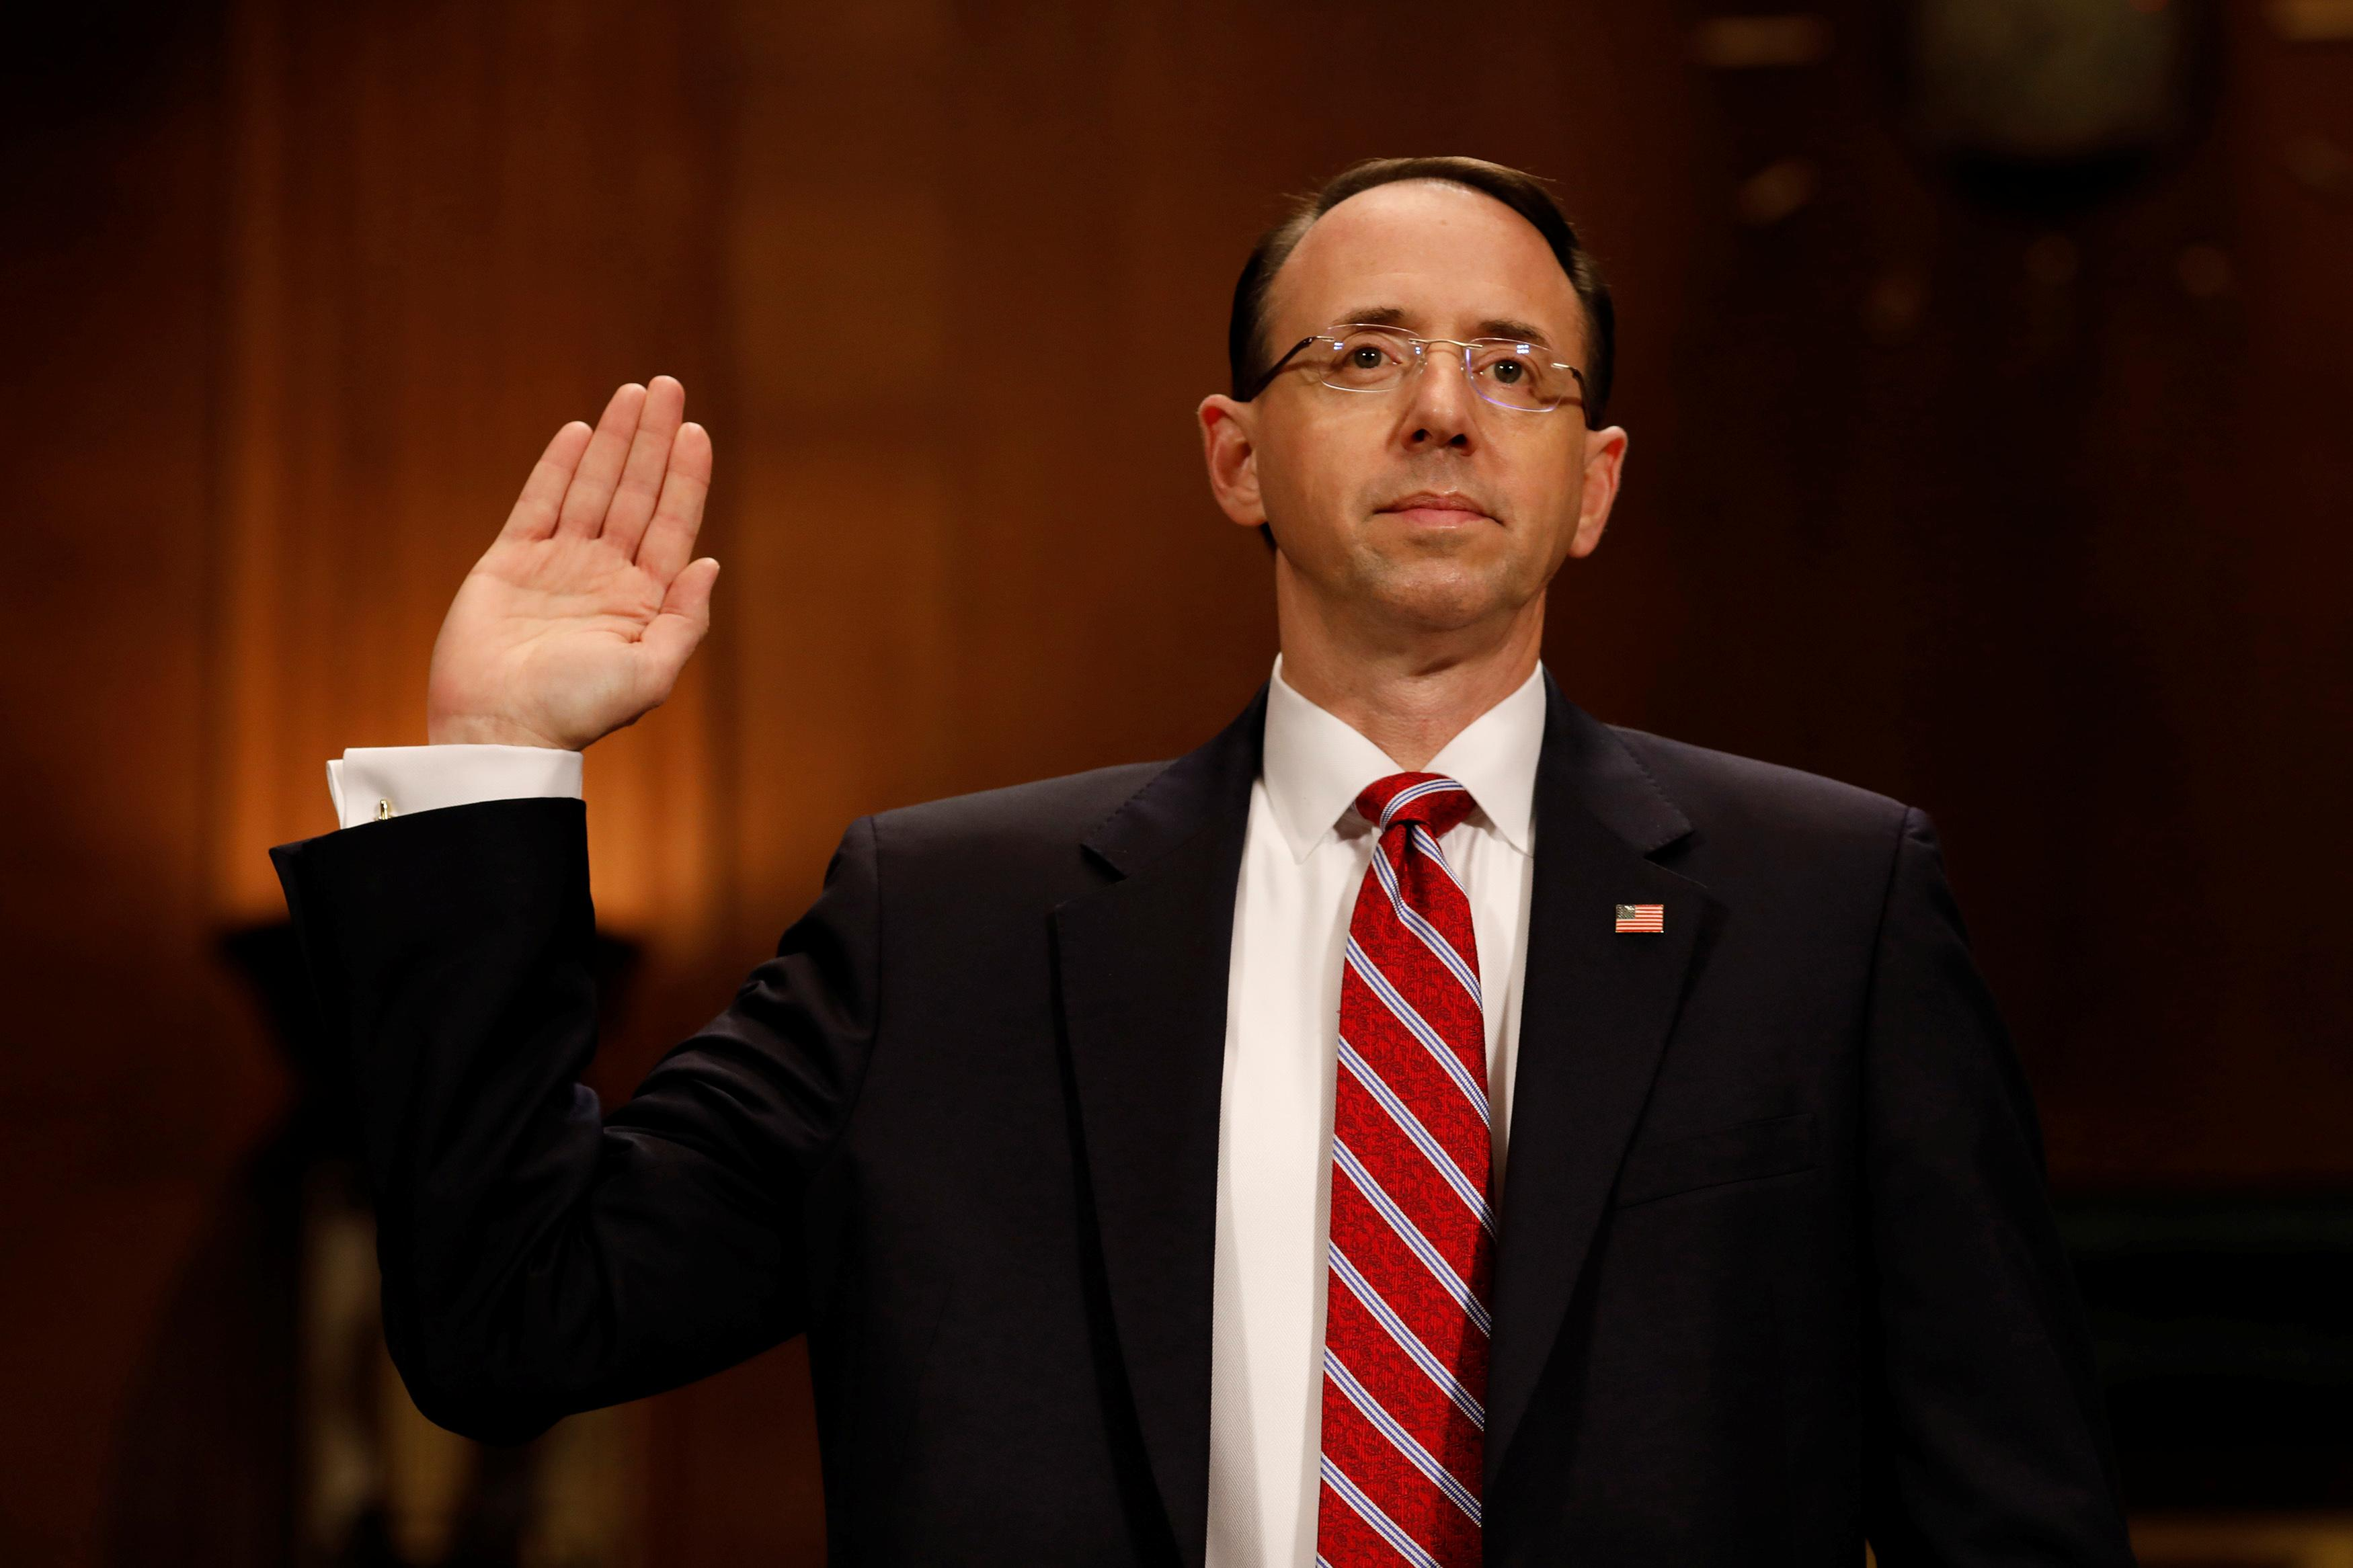 Rod Jay Rosenstein ˈ r oʊ z ən ˌ s t aɪ n born January 13 1965 is an American attorney serving as United States Deputy Attorney General since 2017